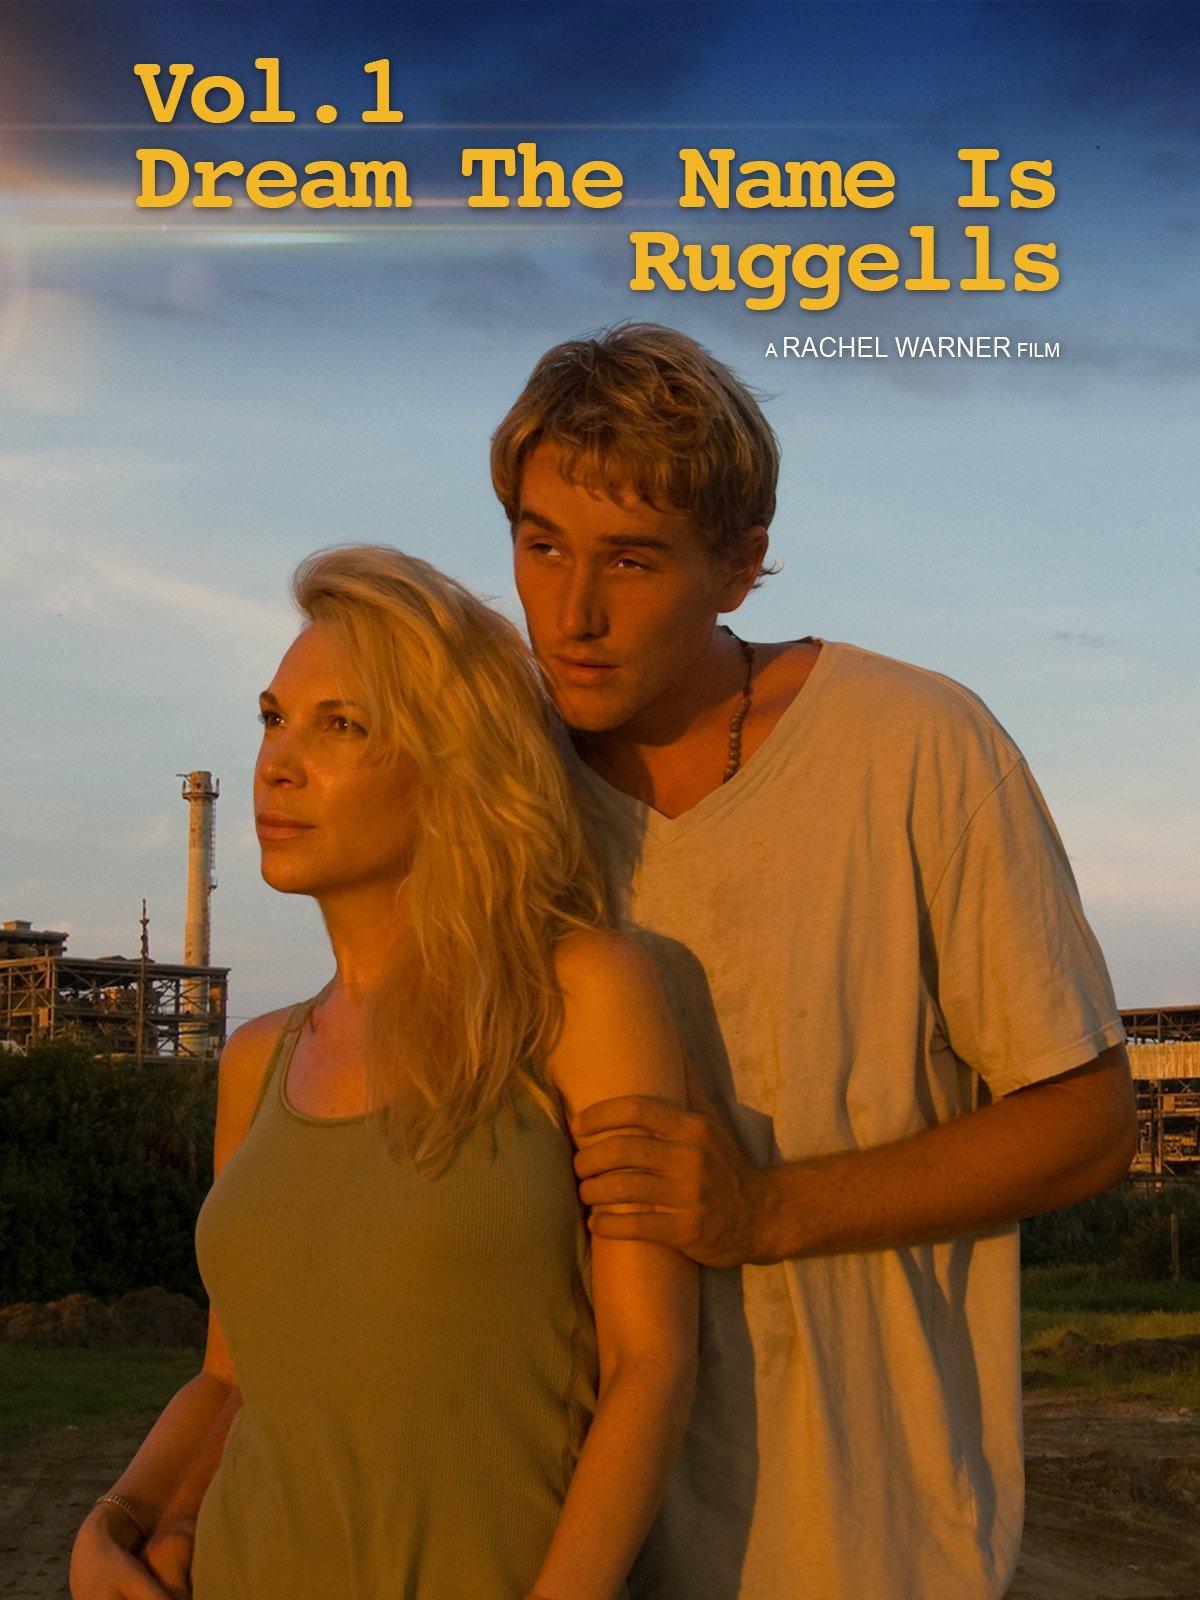 Vol. 1 Dream The Name Is Ruggells